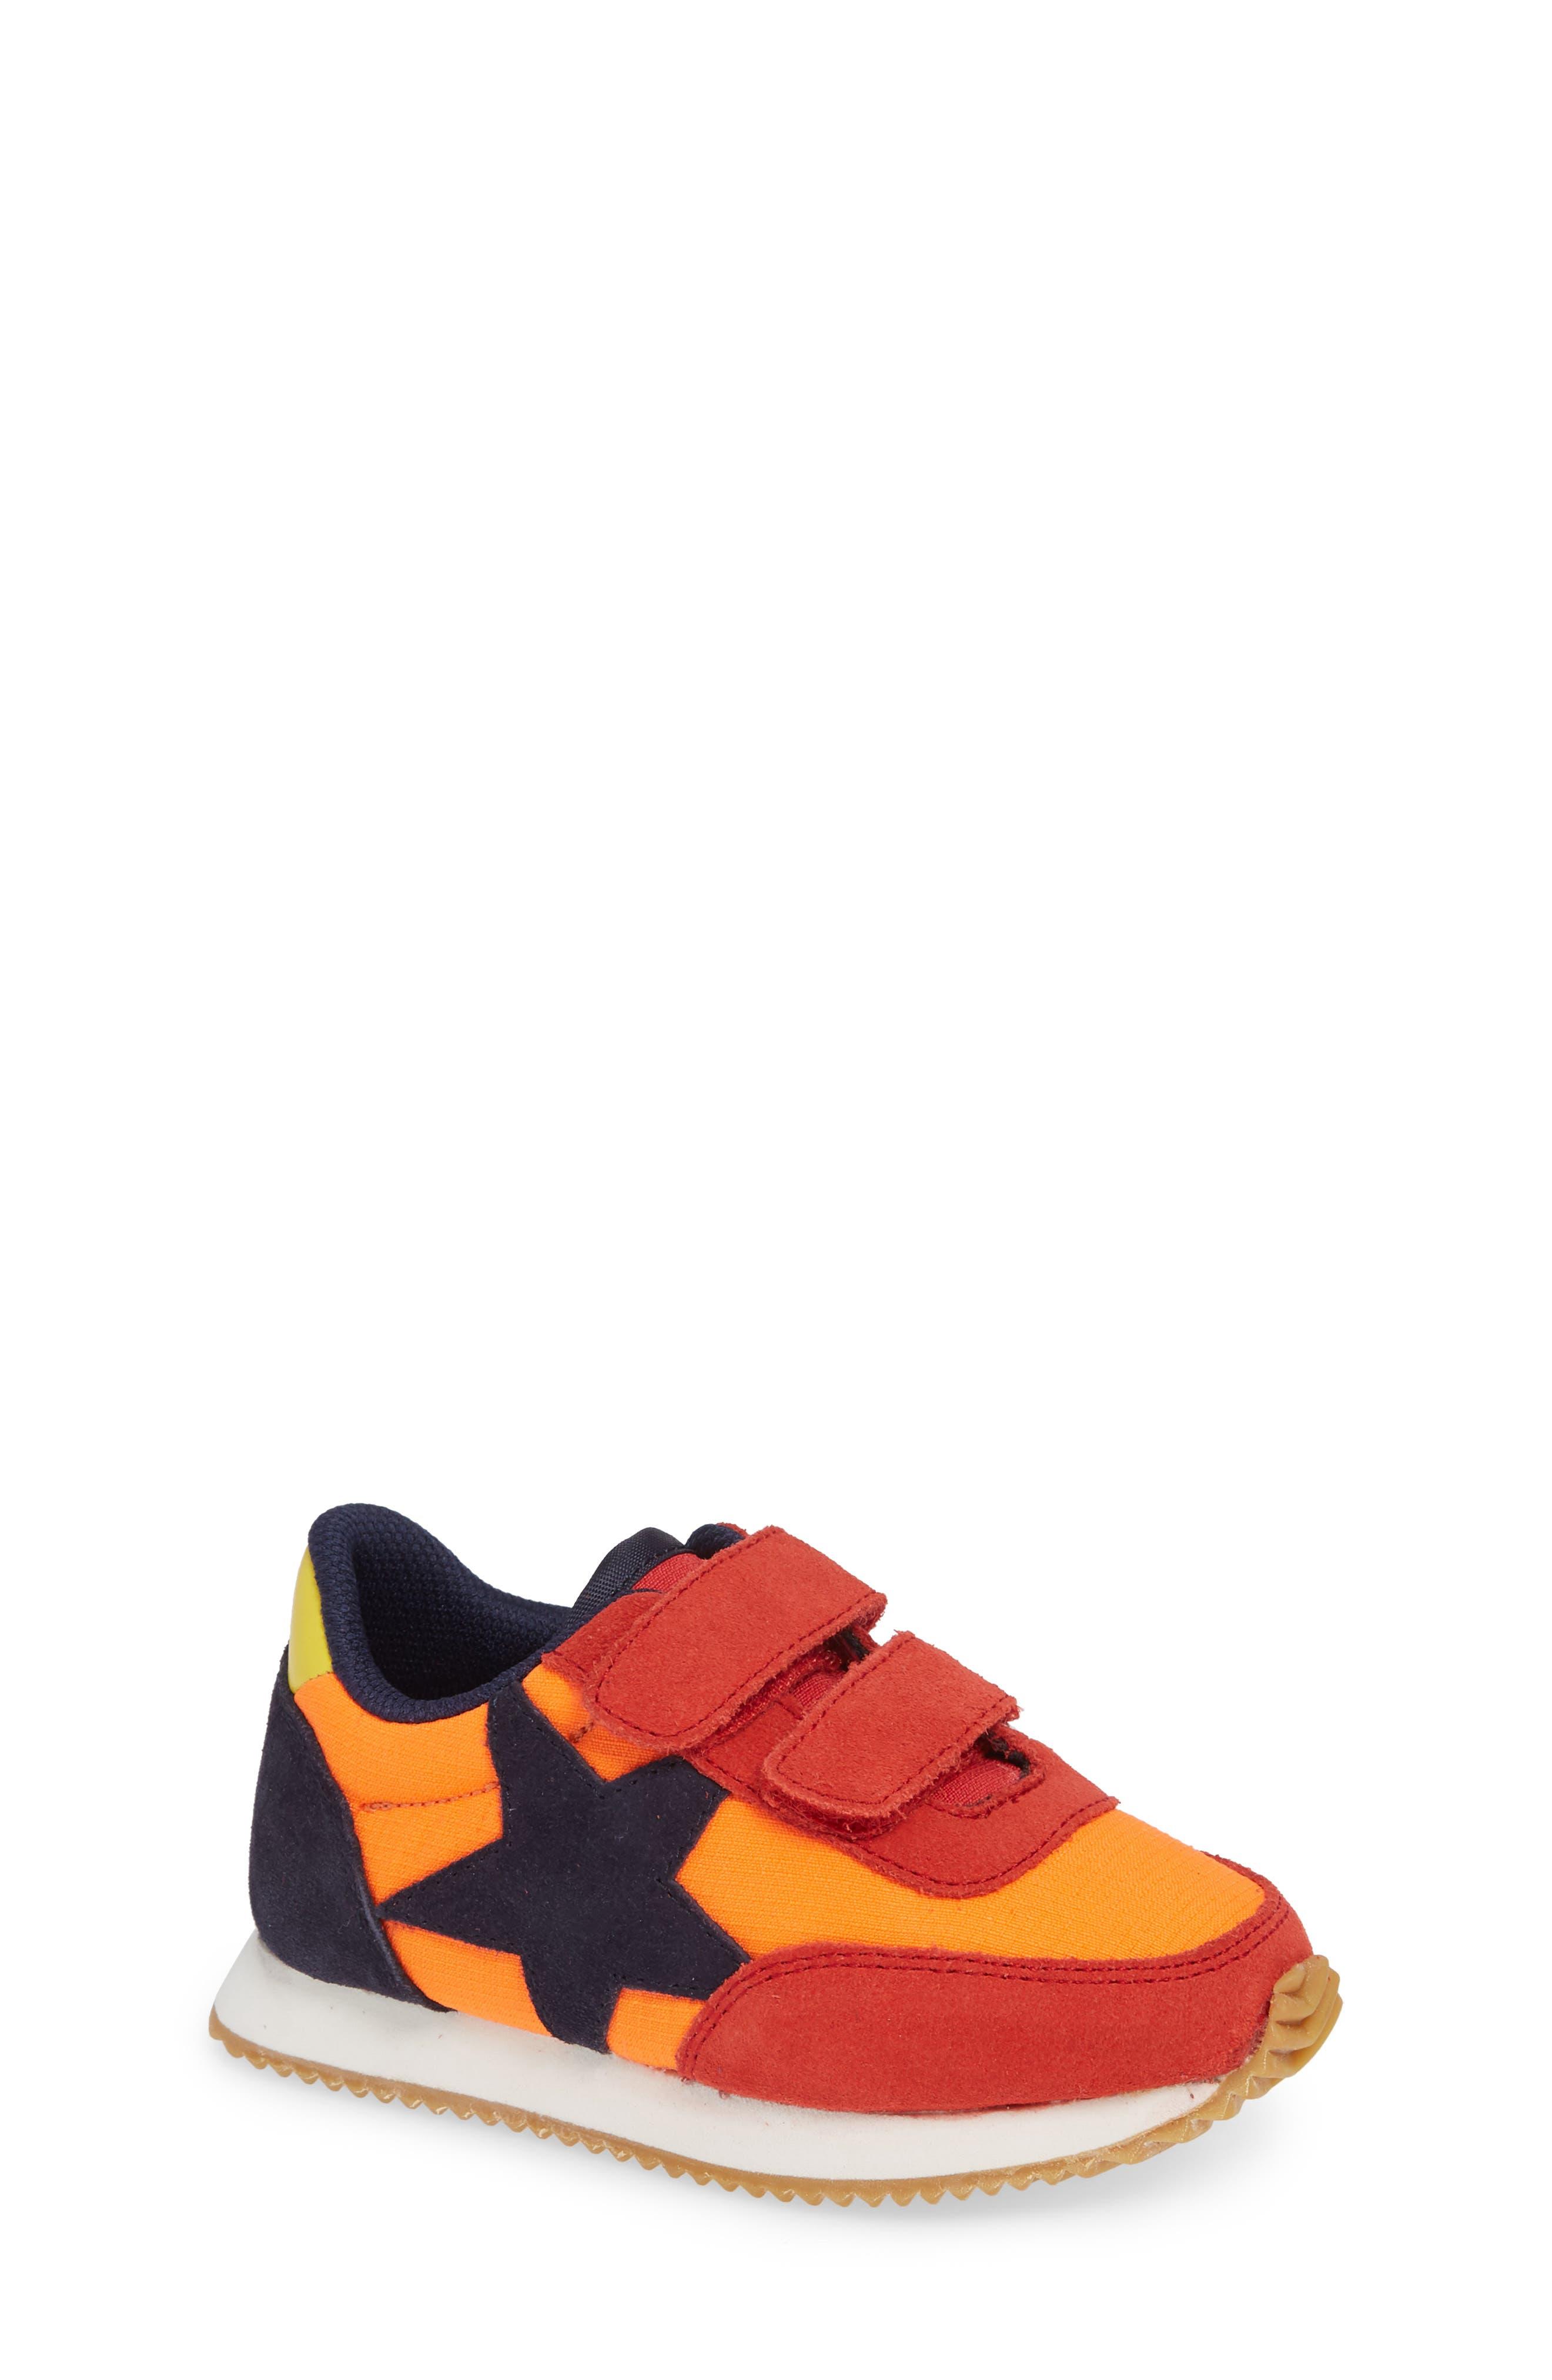 Print Sneakers,                             Main thumbnail 1, color,                             SALSA RED